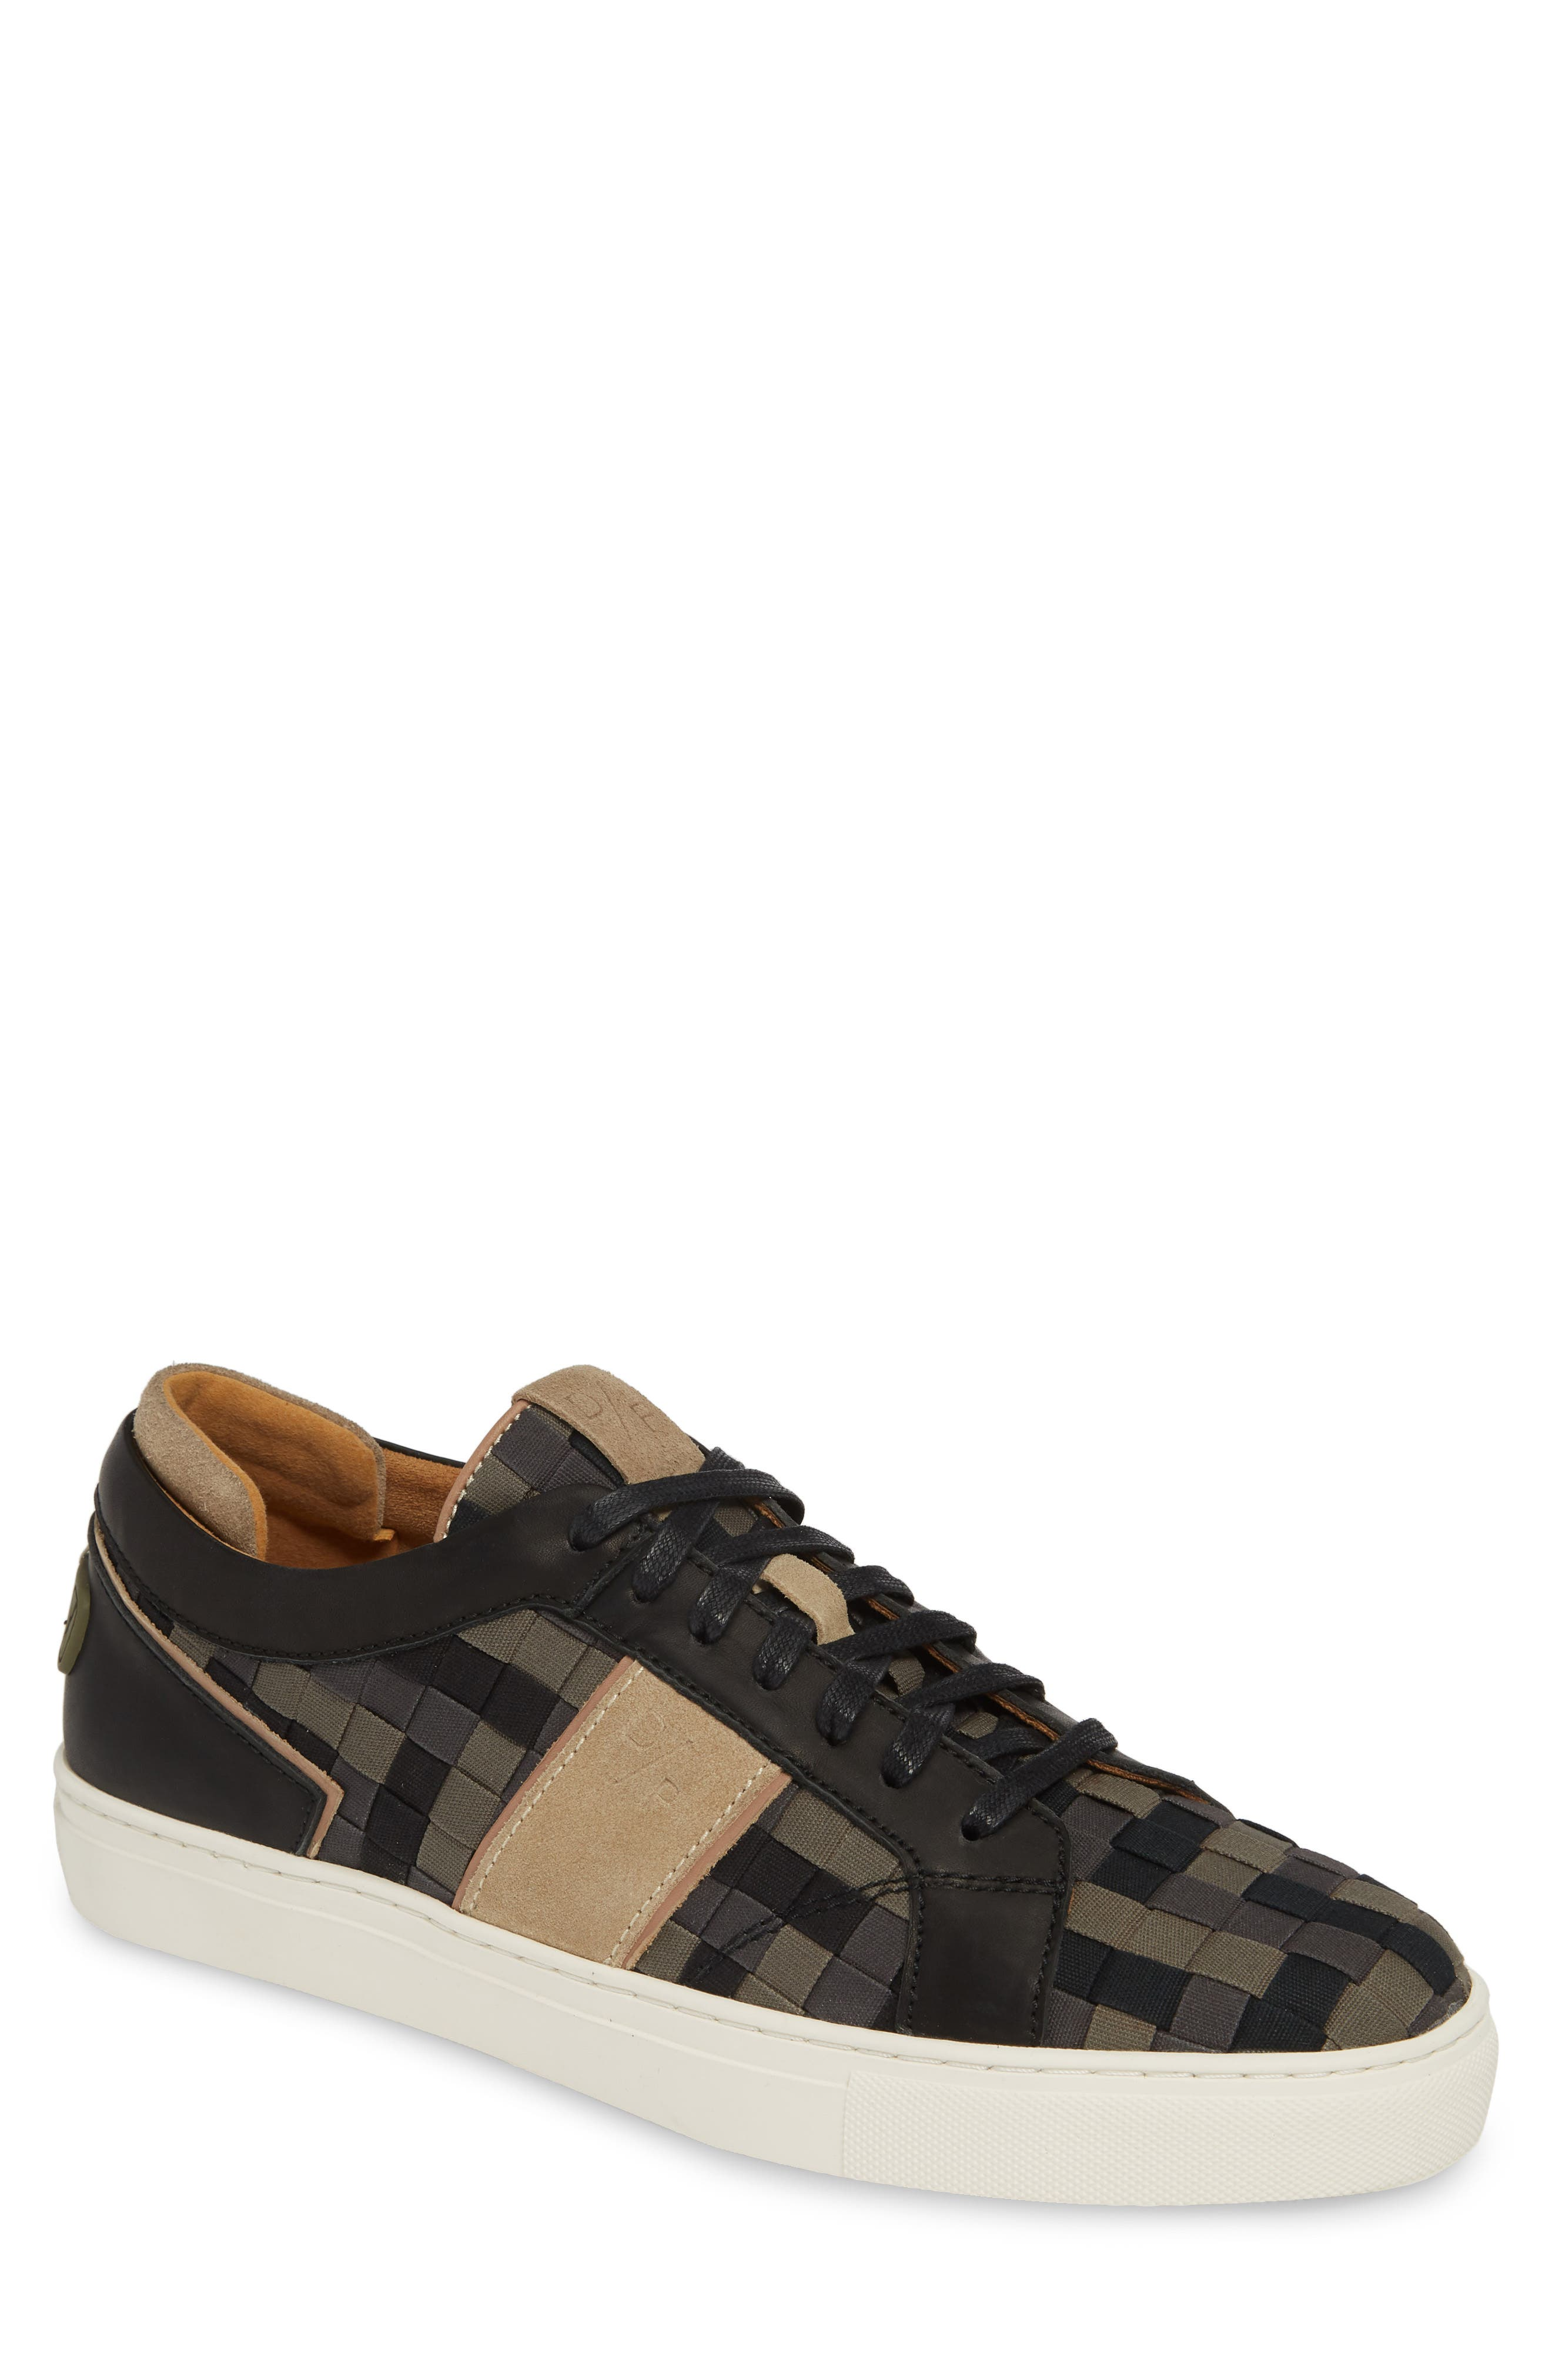 Donald Pliner Andrew Pring Sneaker